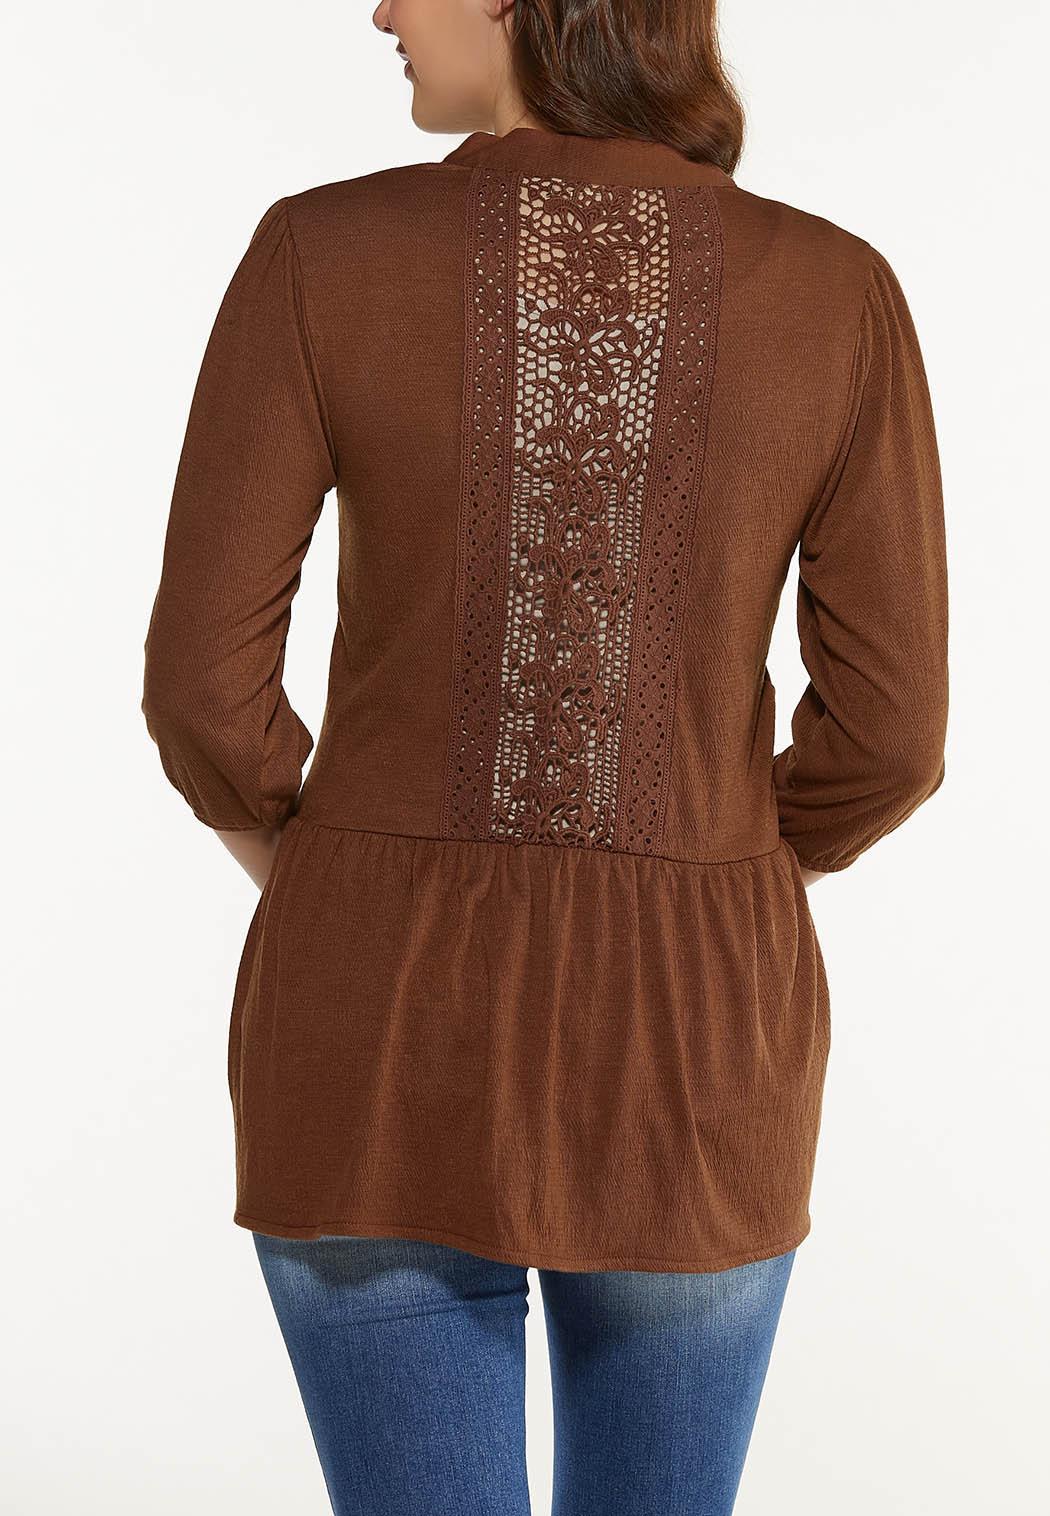 Brown Crochet Cardigan (Item #44555992)